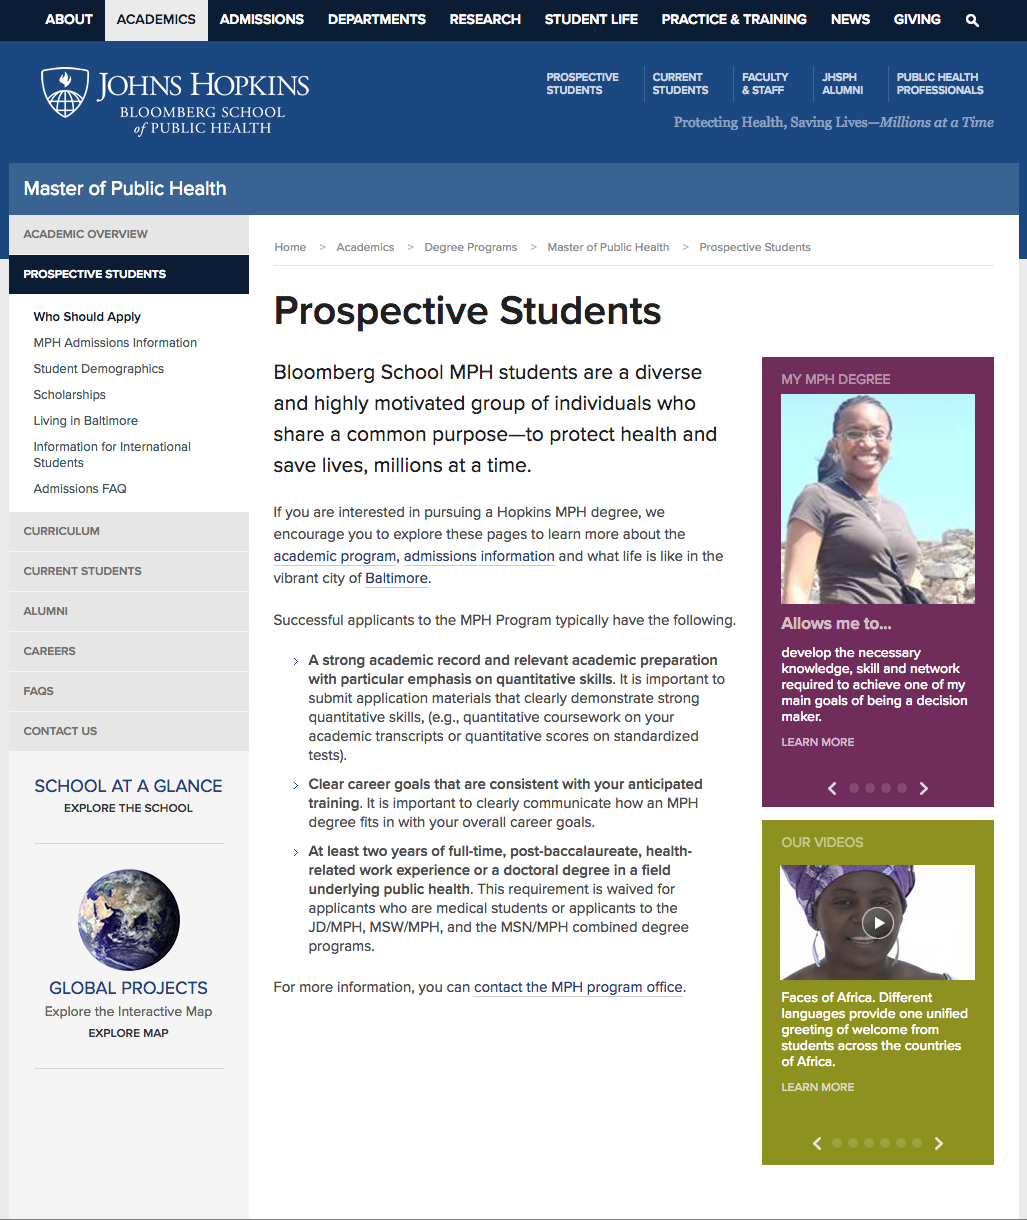 JHB - MPH_PROSPECTIVE STUDENTS.png